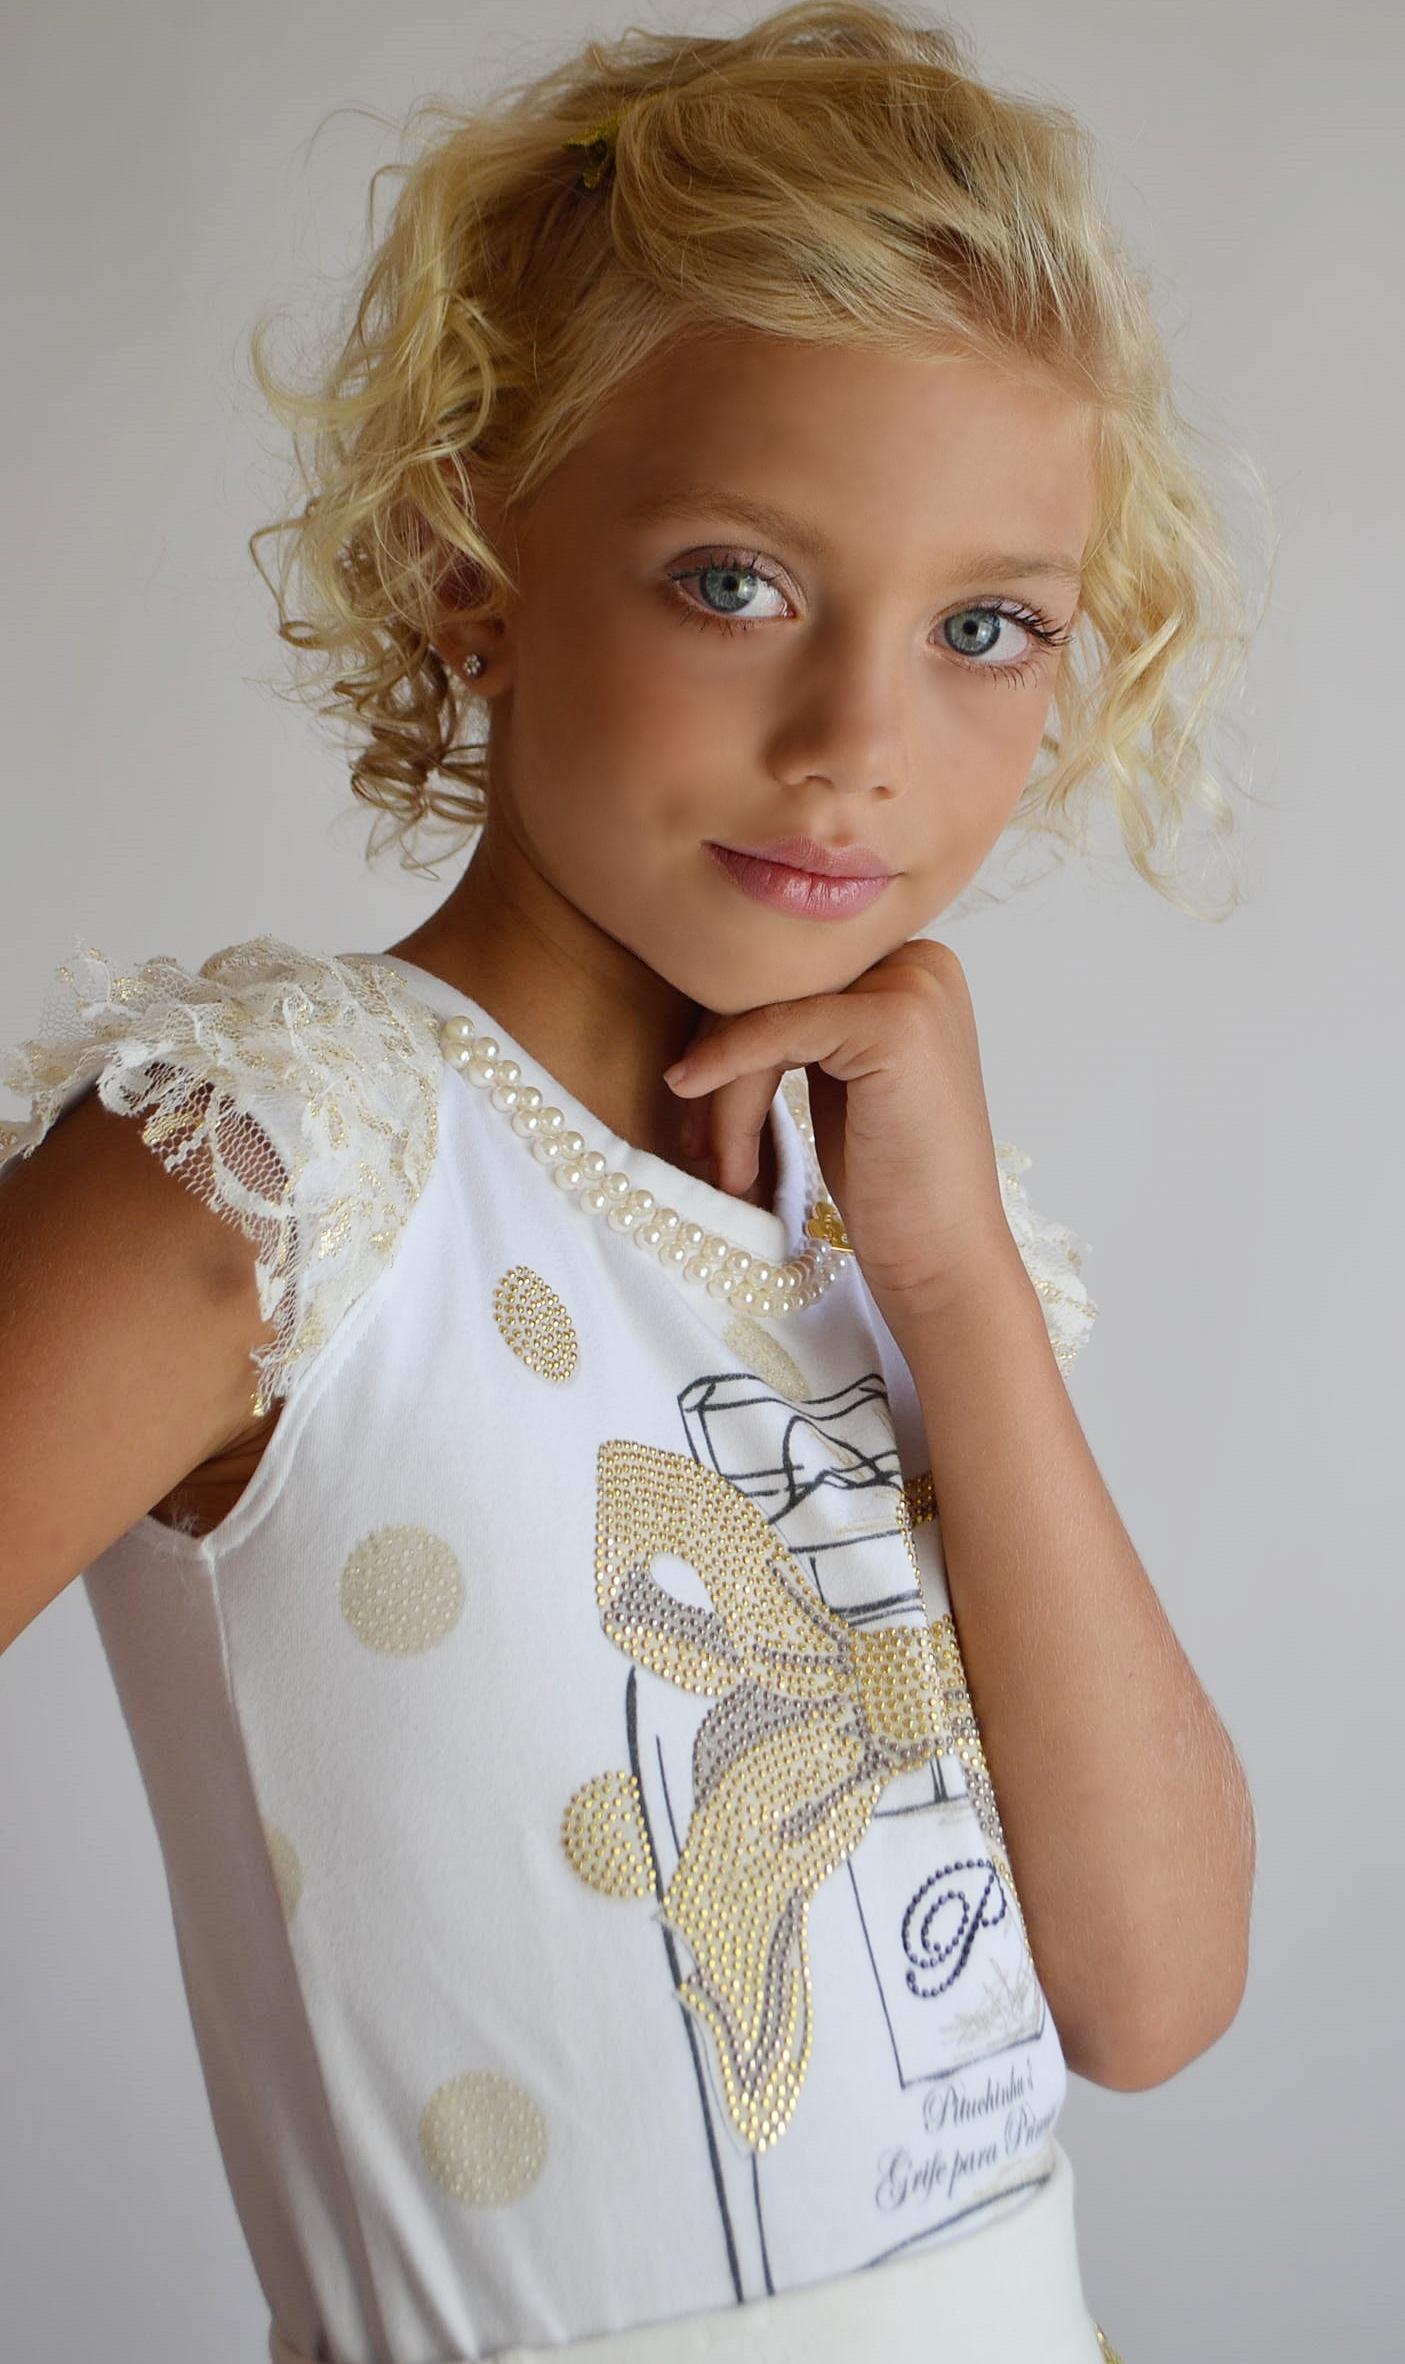 Hanne Machado